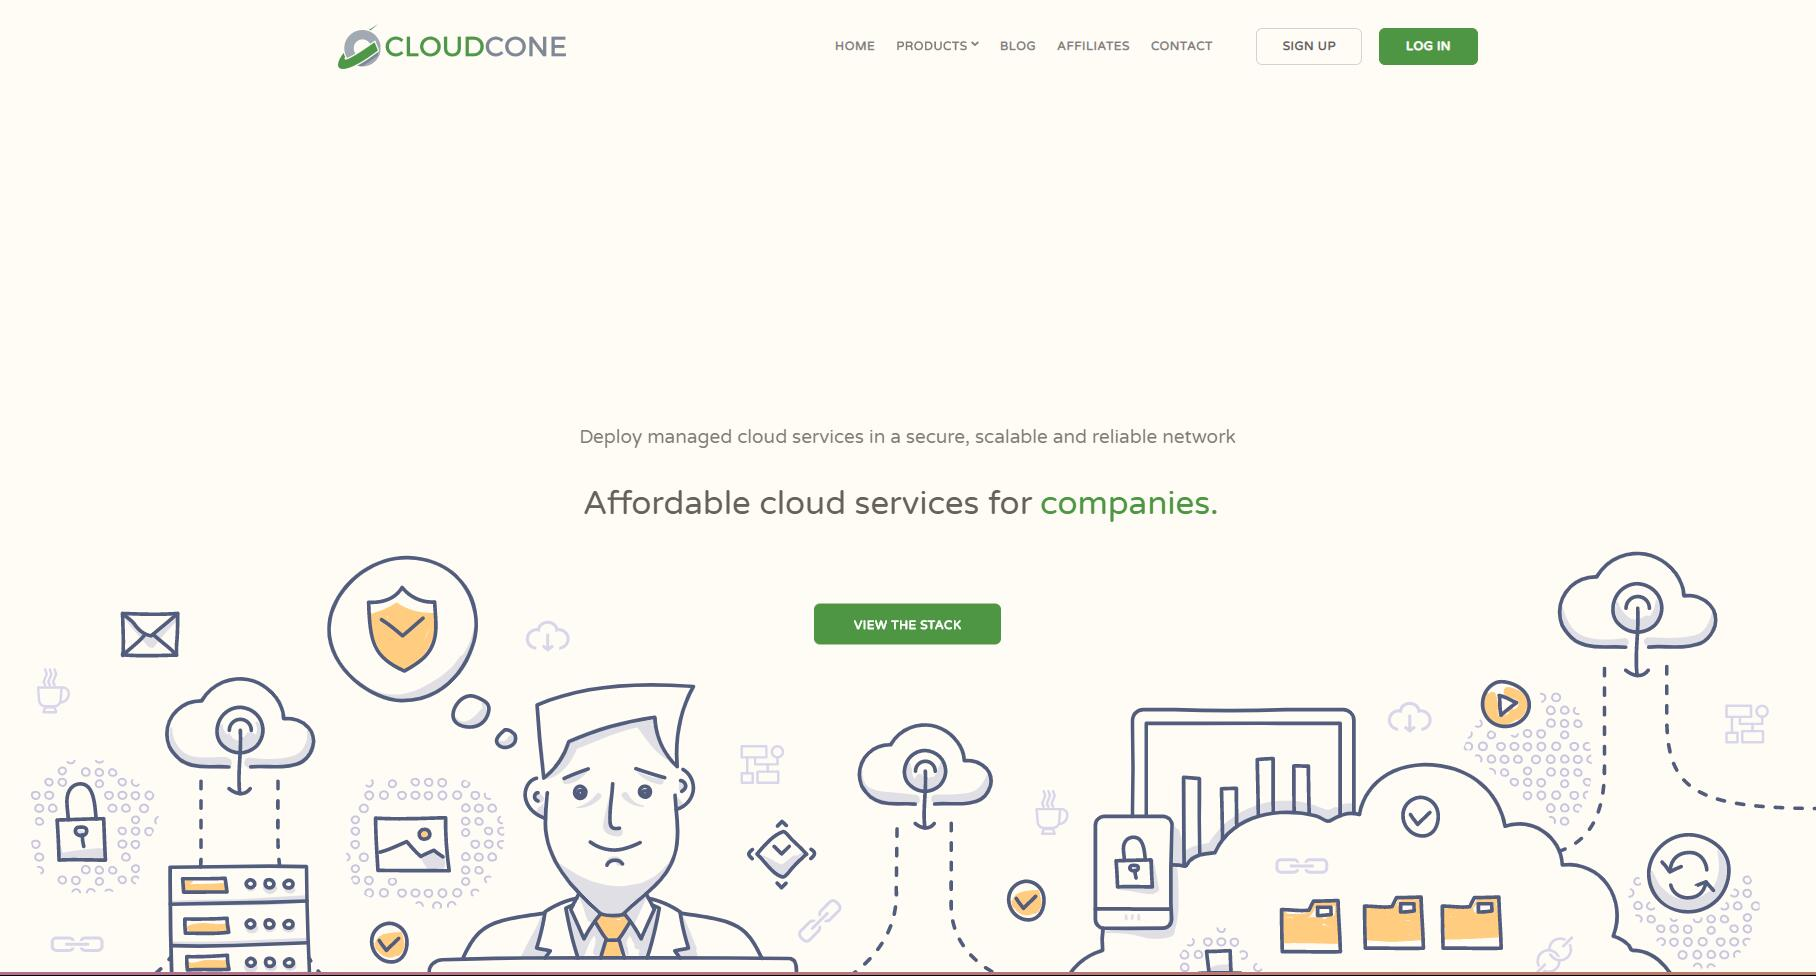 cloudcone:新开Windows系列VPS,$17.49/月,4G内存/3核/60gSSD/3T流量